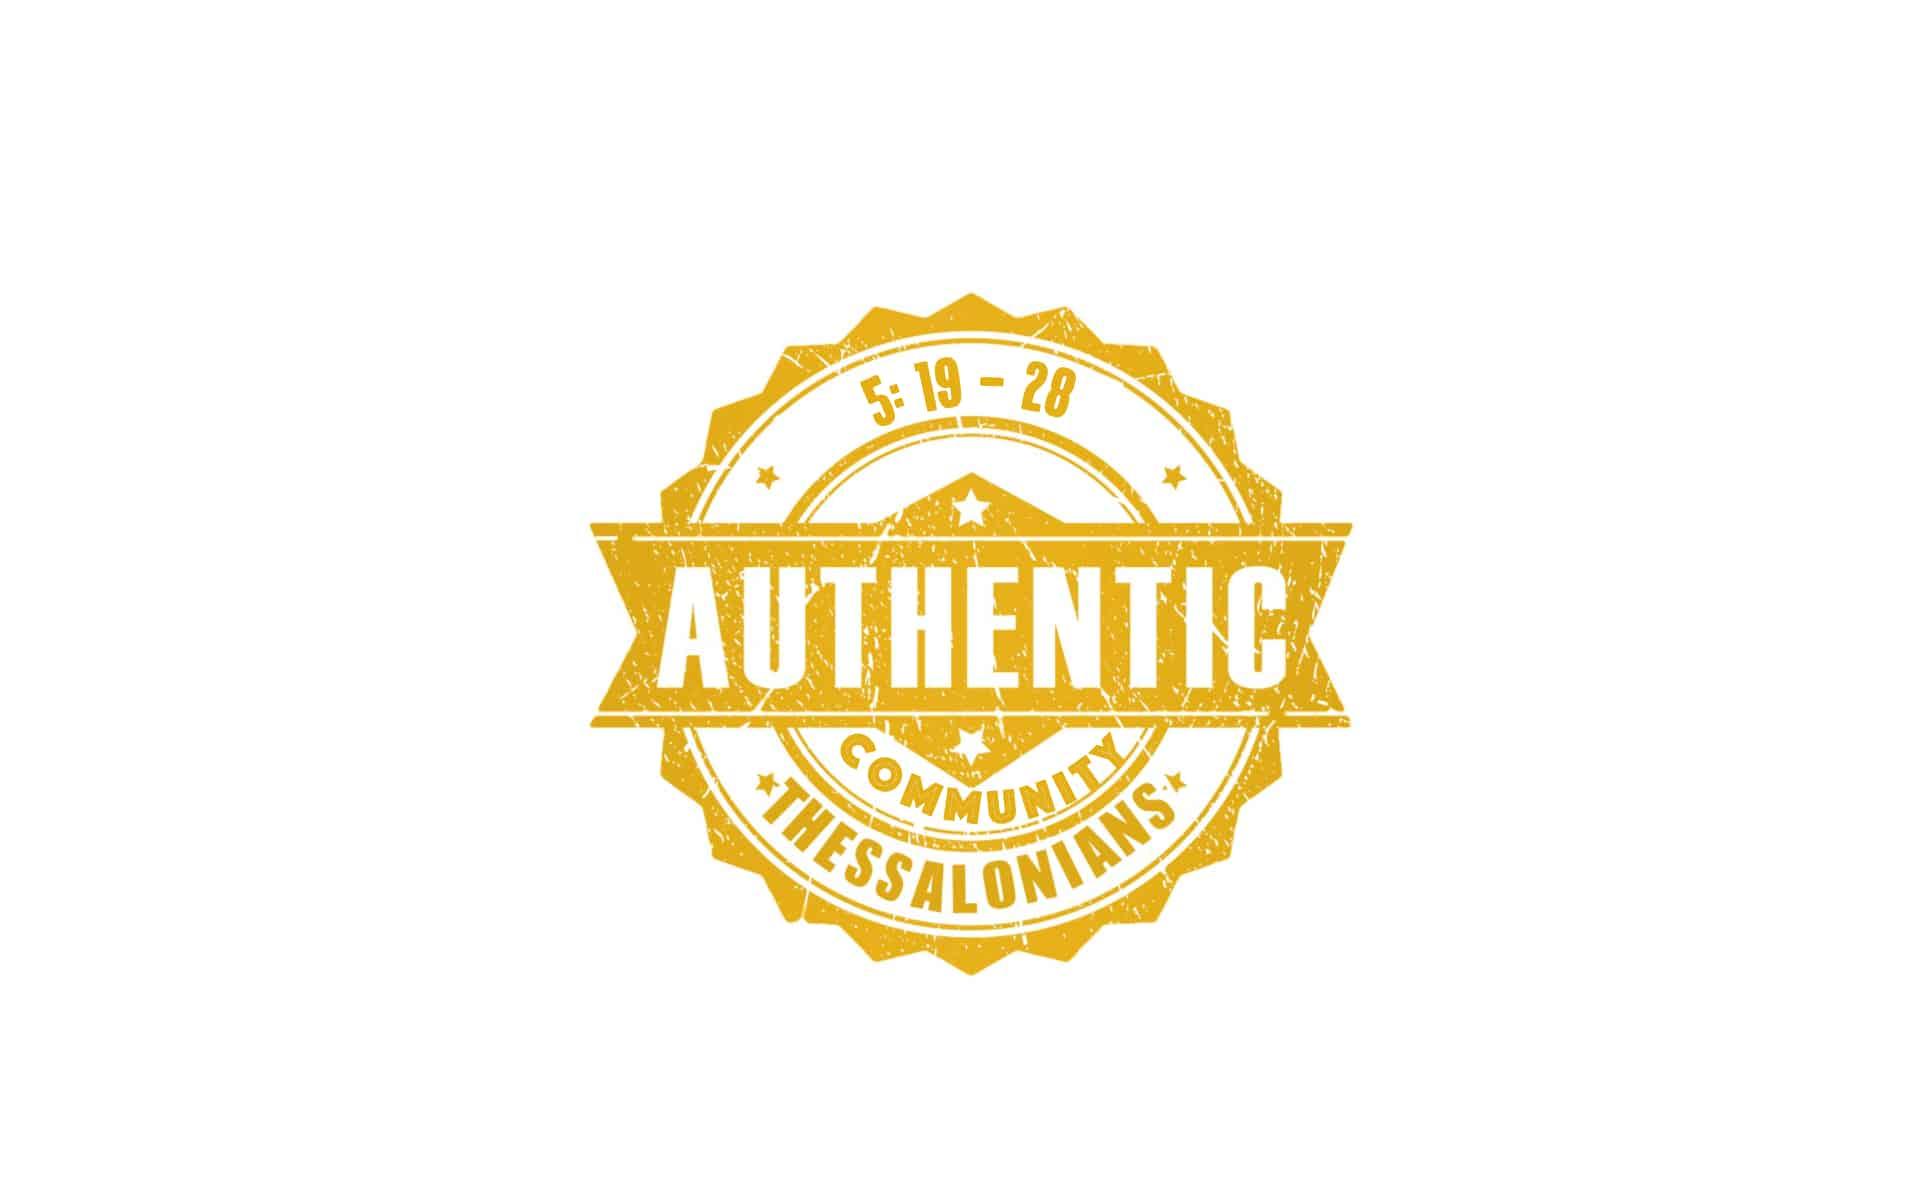 Authentic Community #4